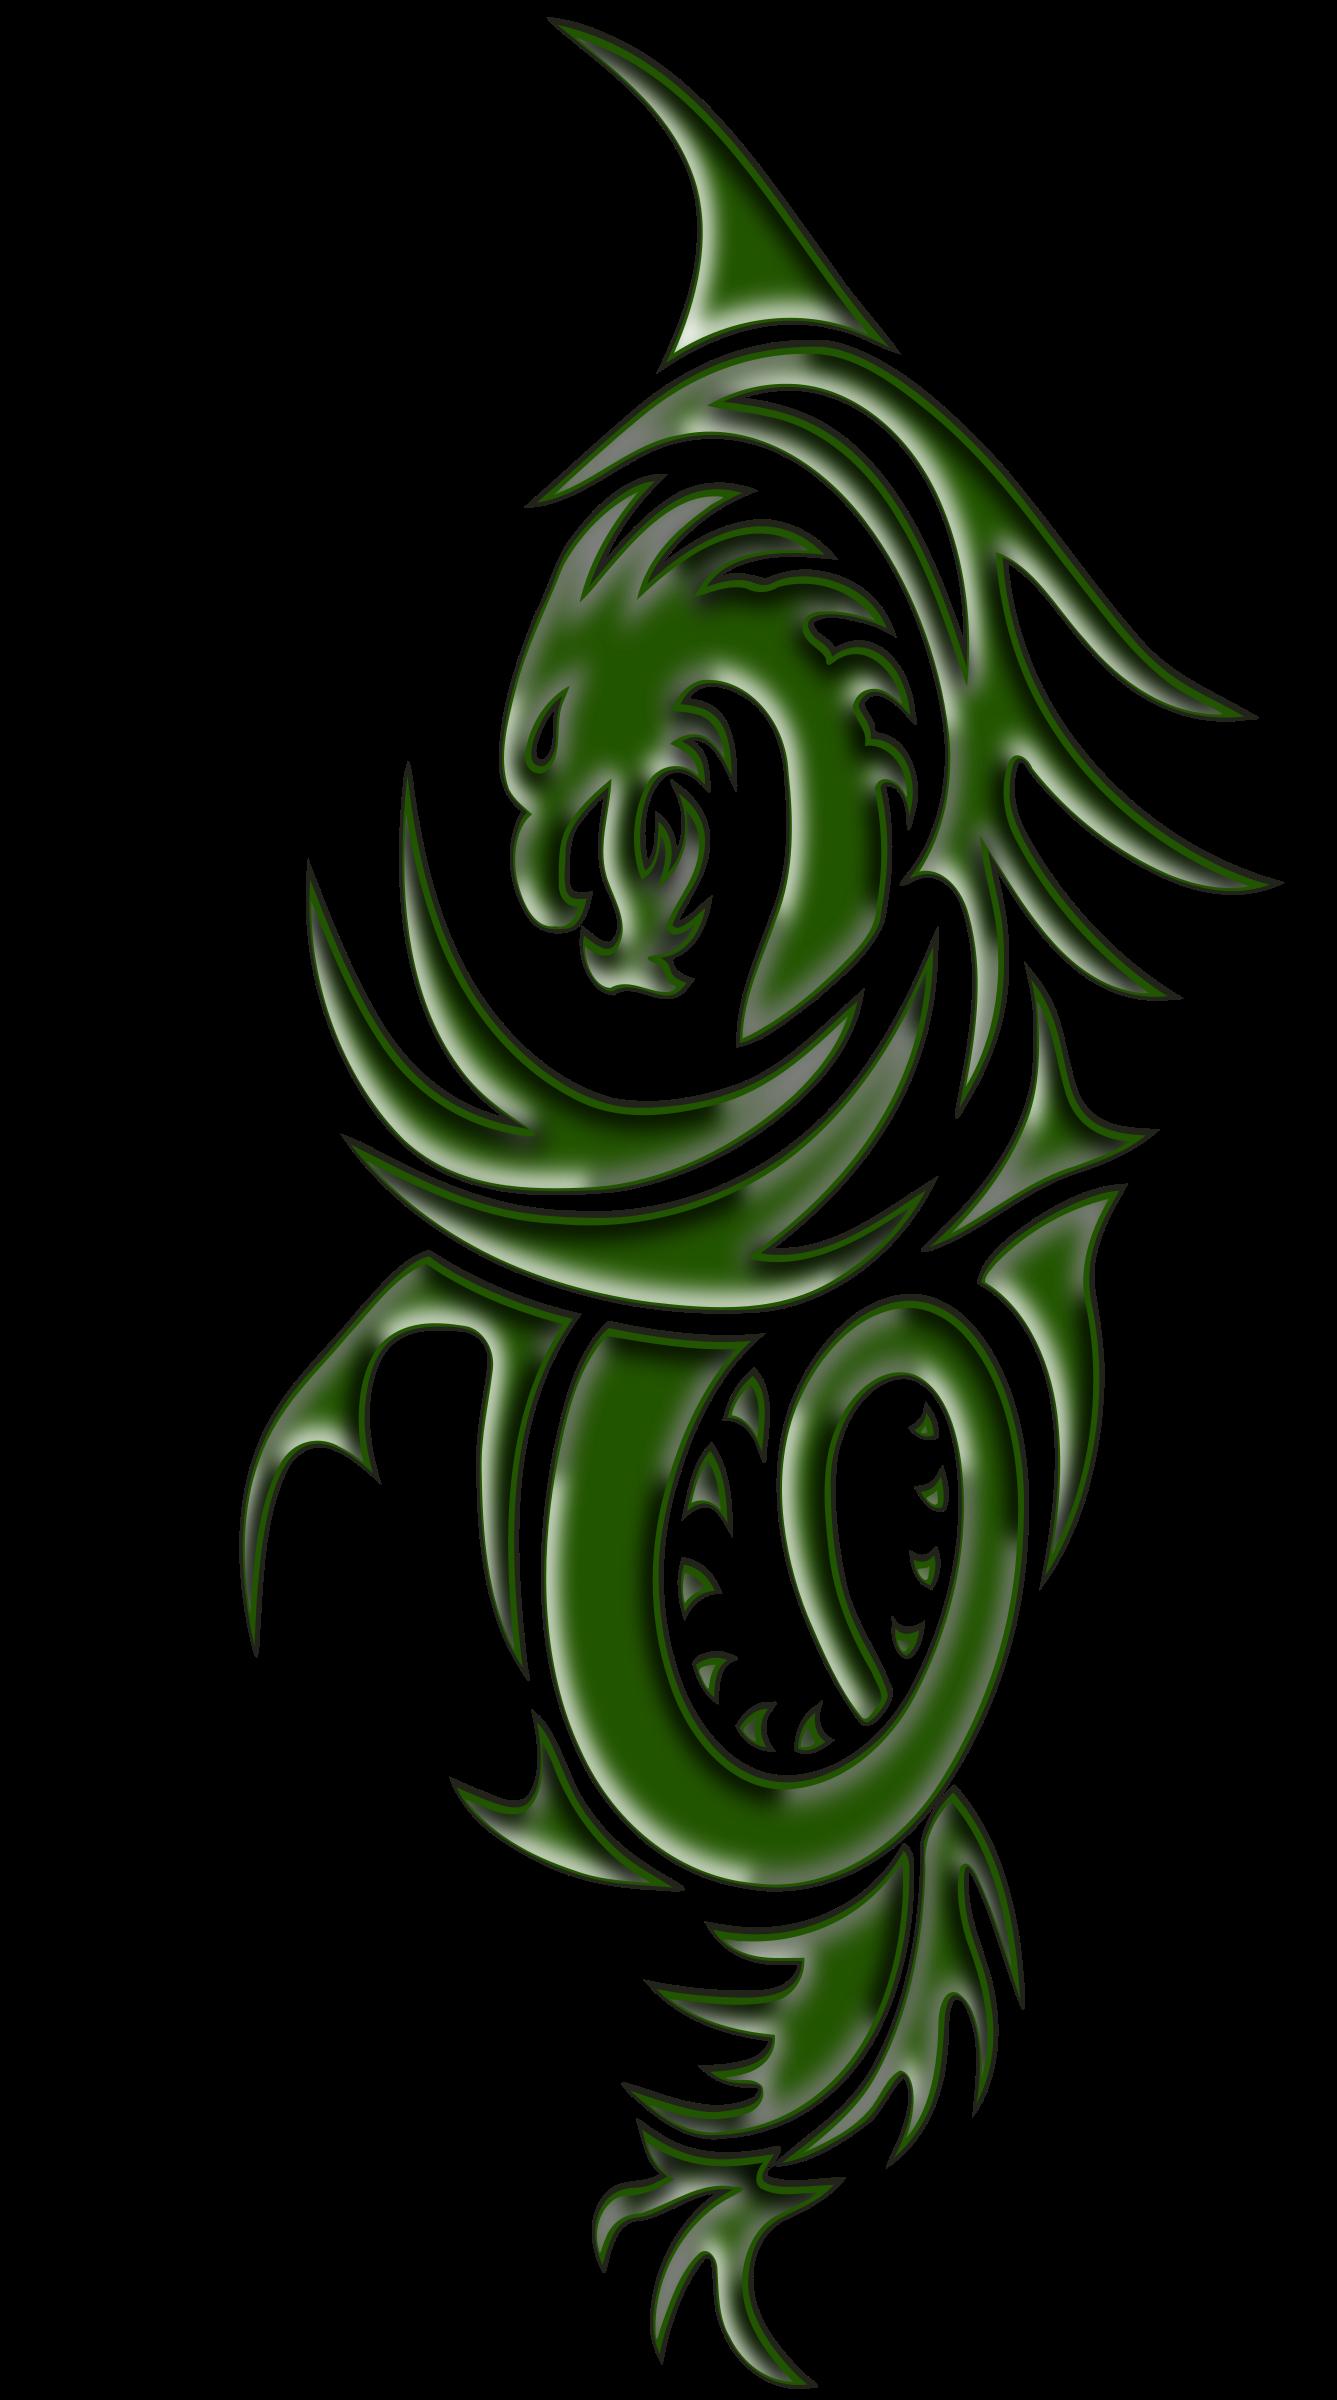 Dragon clipart simple, Picture #948508 dragon clipart simple.